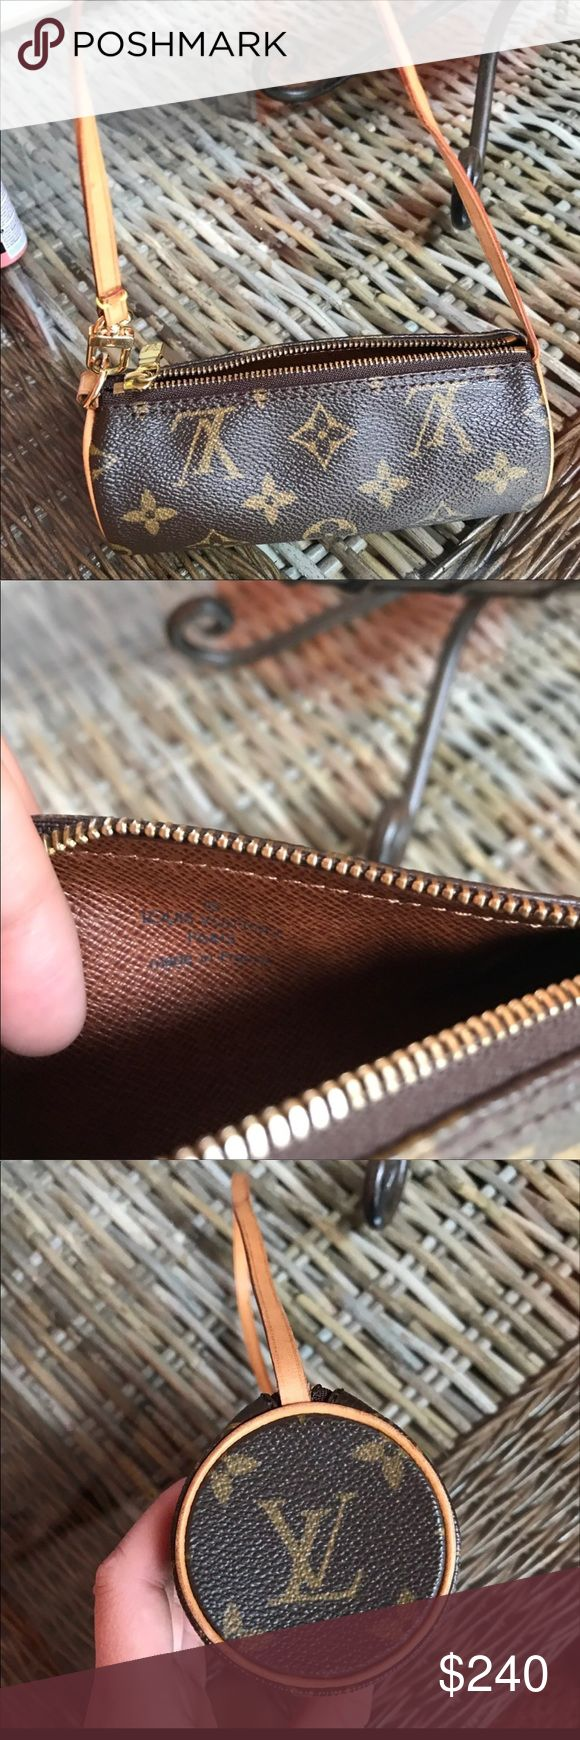 Authentic Louis Vuitton monogram mini wristlet! Super cute monogram wristlet from Louis Vuitton :) 100% authentic! Louis Vuitton Bags Mini Bags